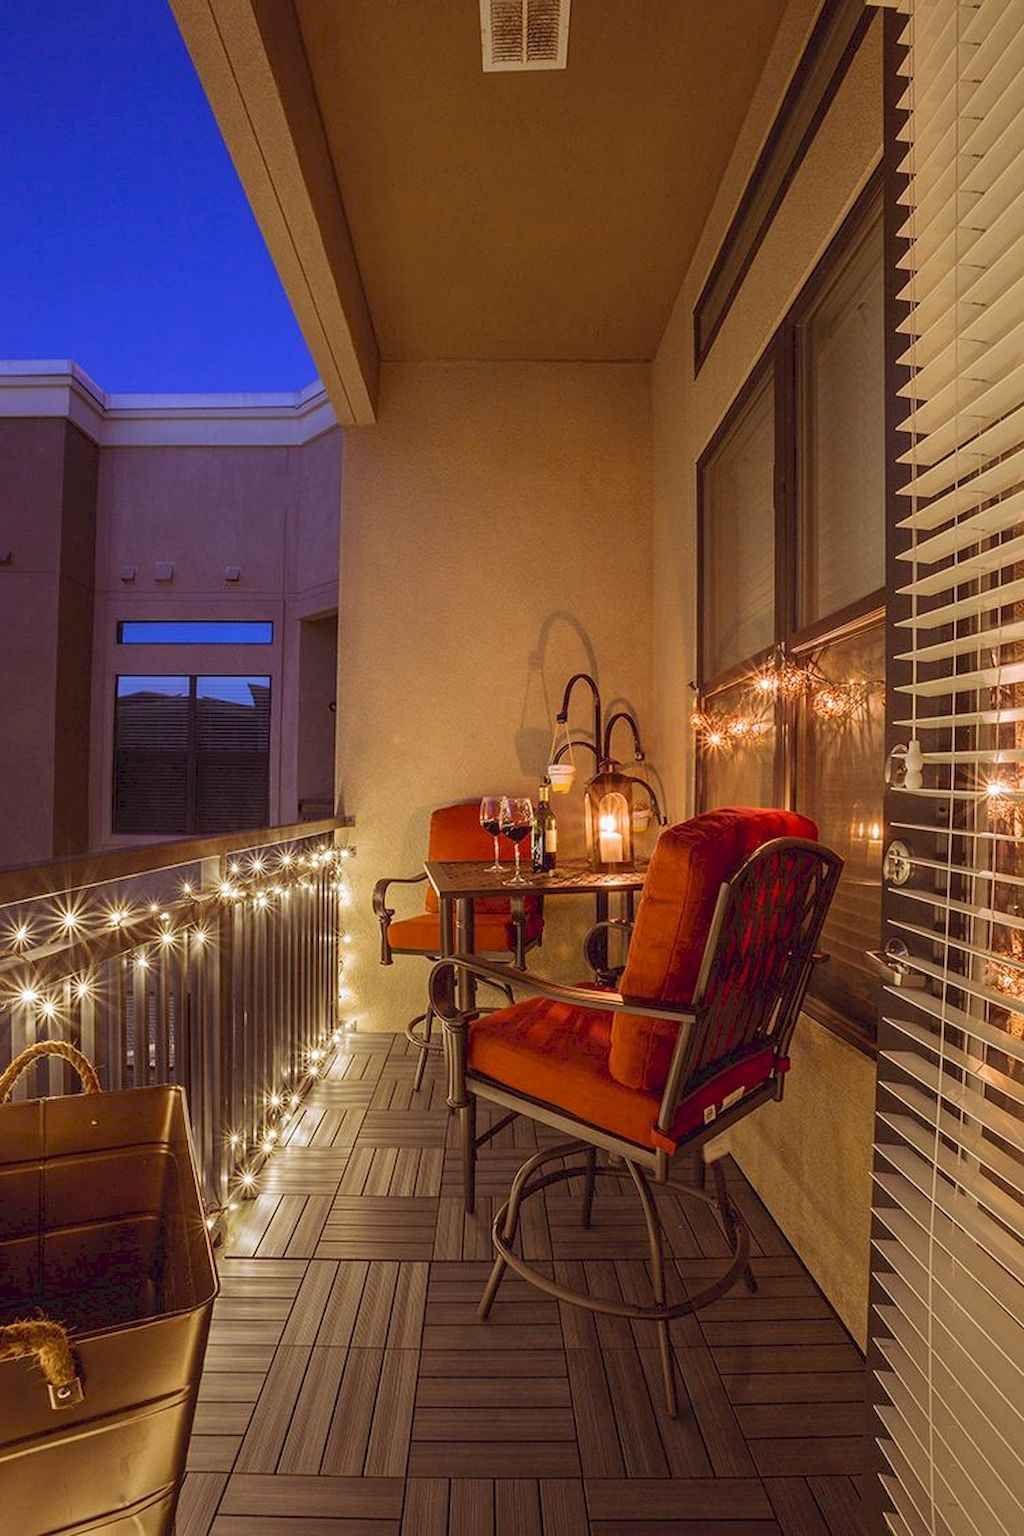 55 Cozy Apartment Balcony Decorating Ideas | Apartment ...